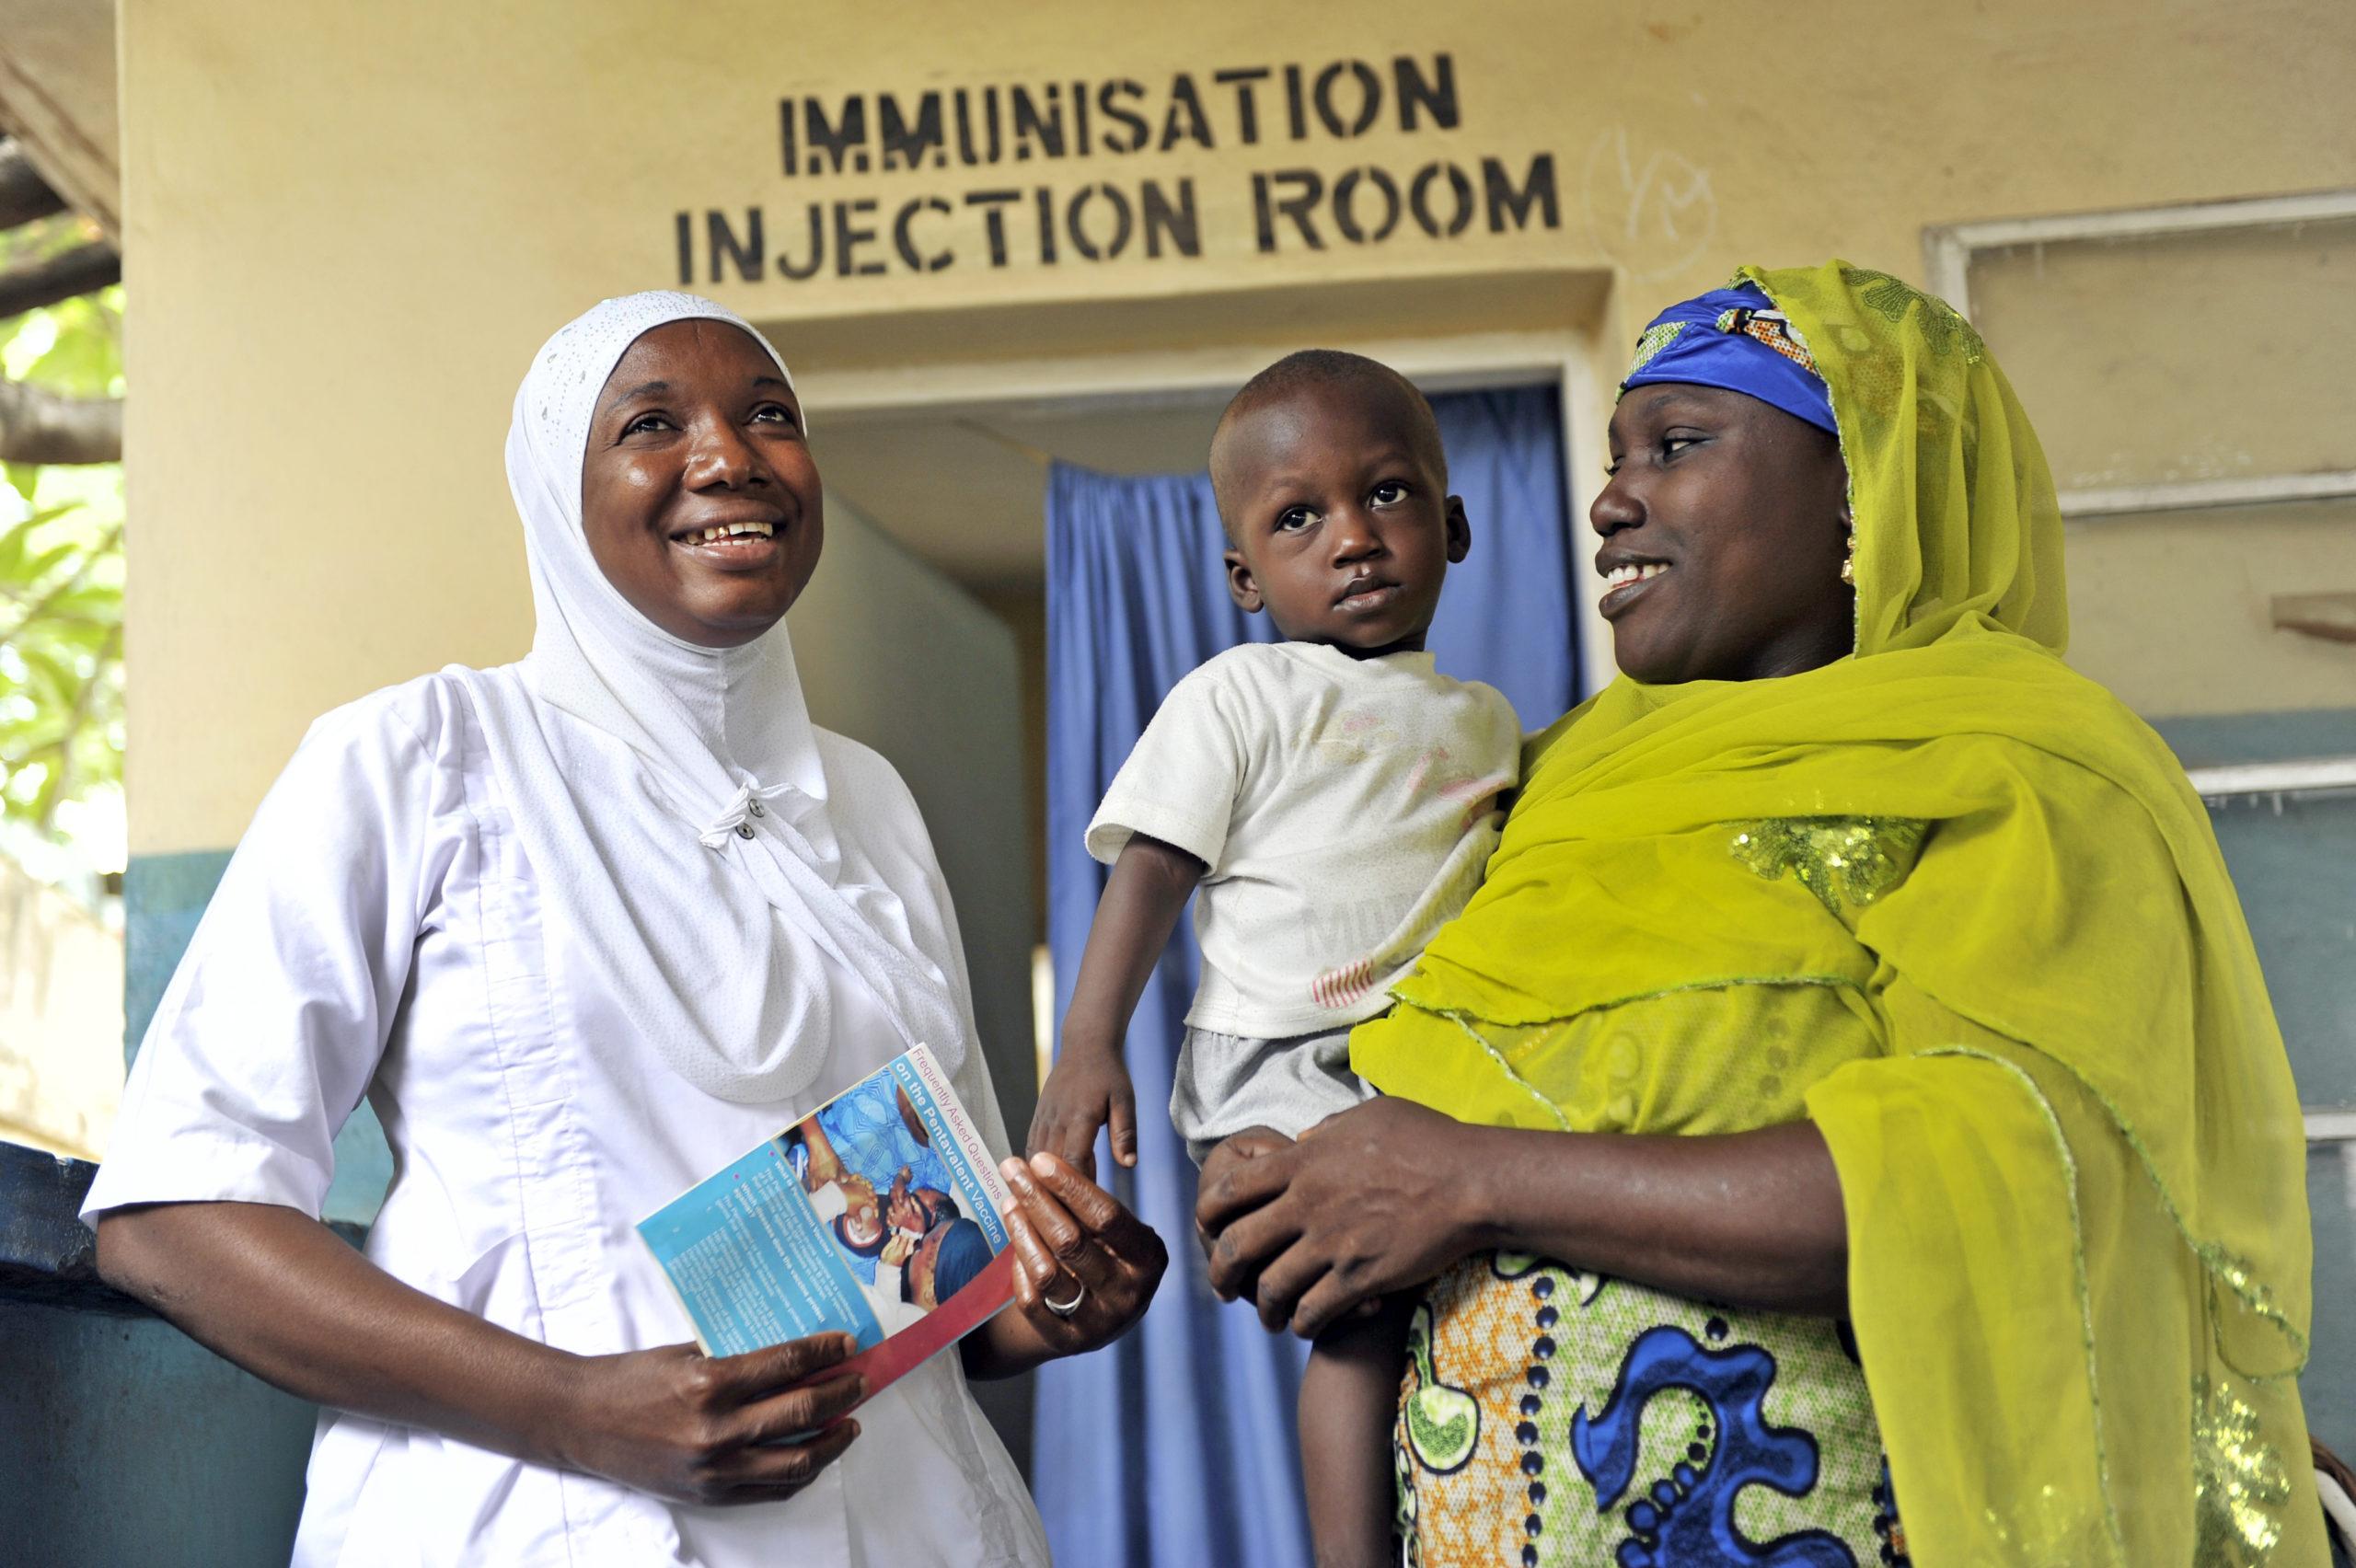 ICAN immunization